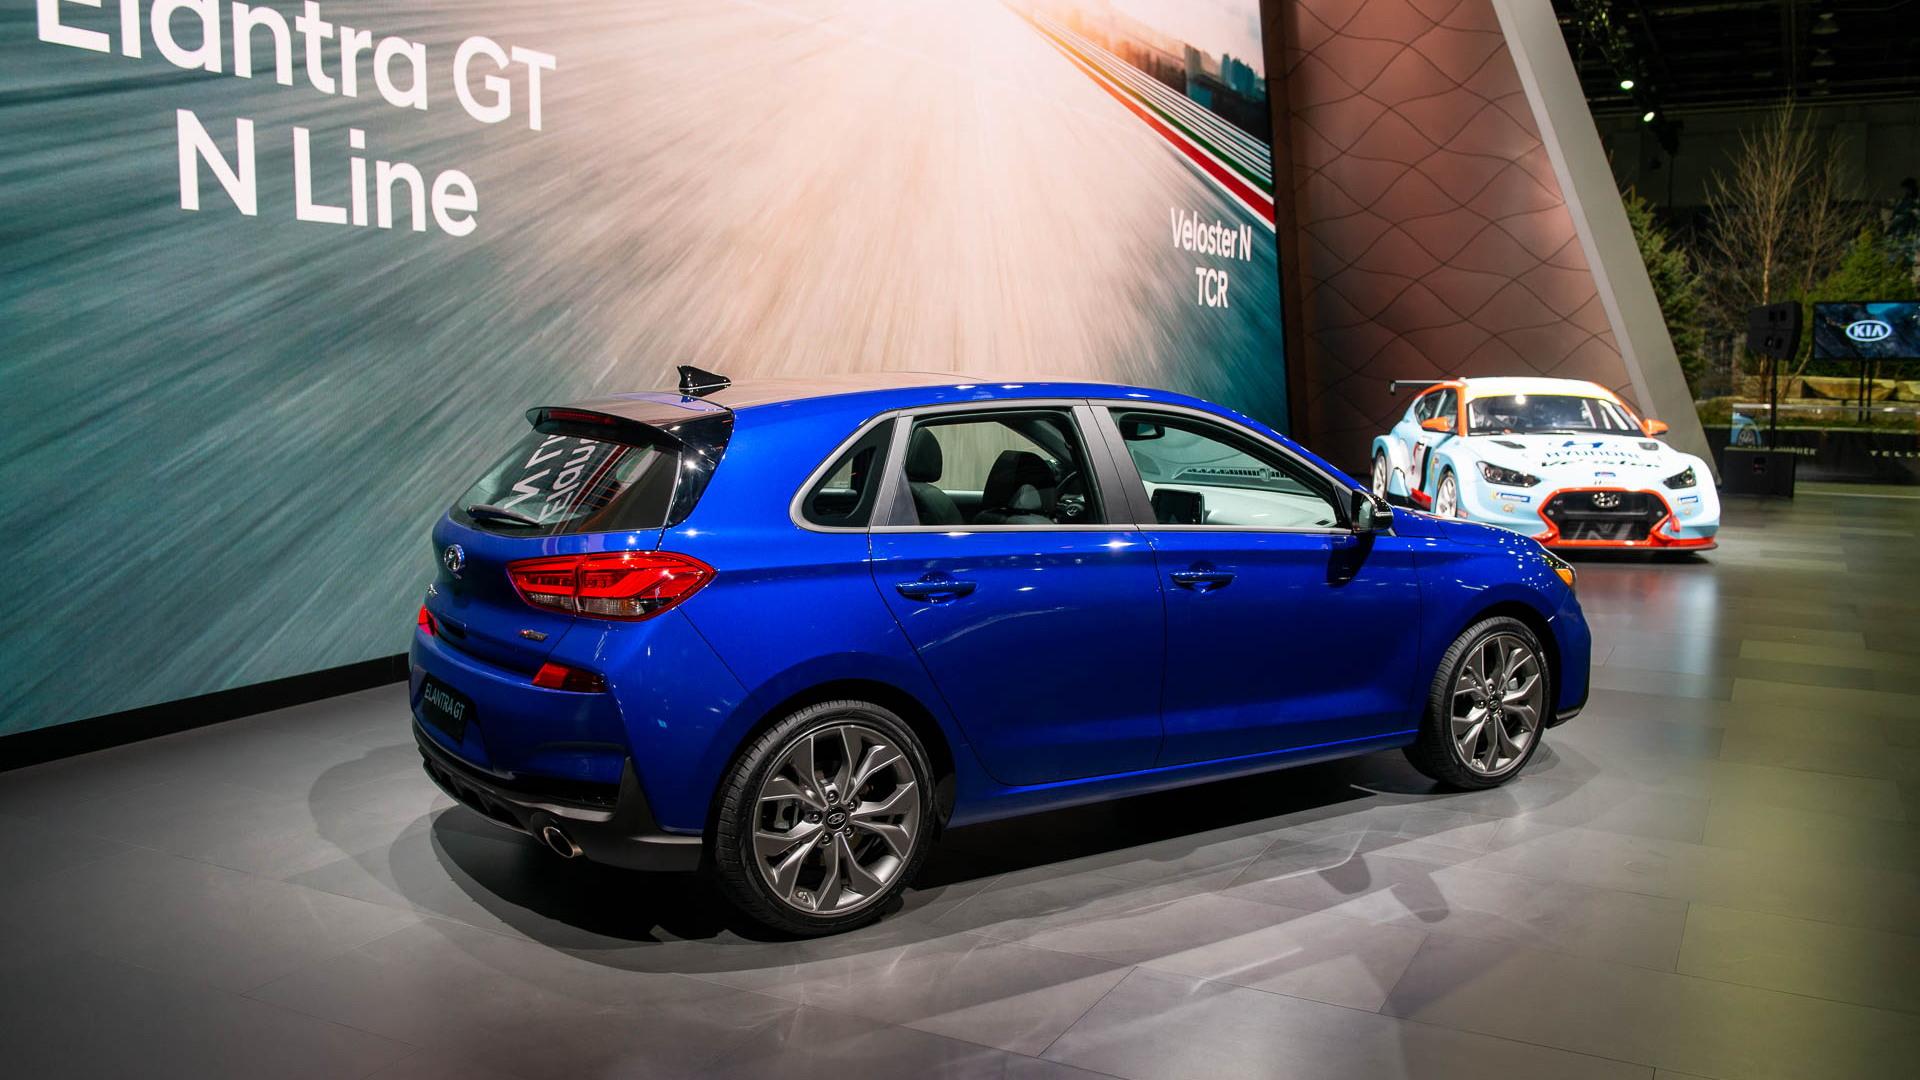 2019 Hyundai Elantra GT N Line, 2019 Detroit auto show